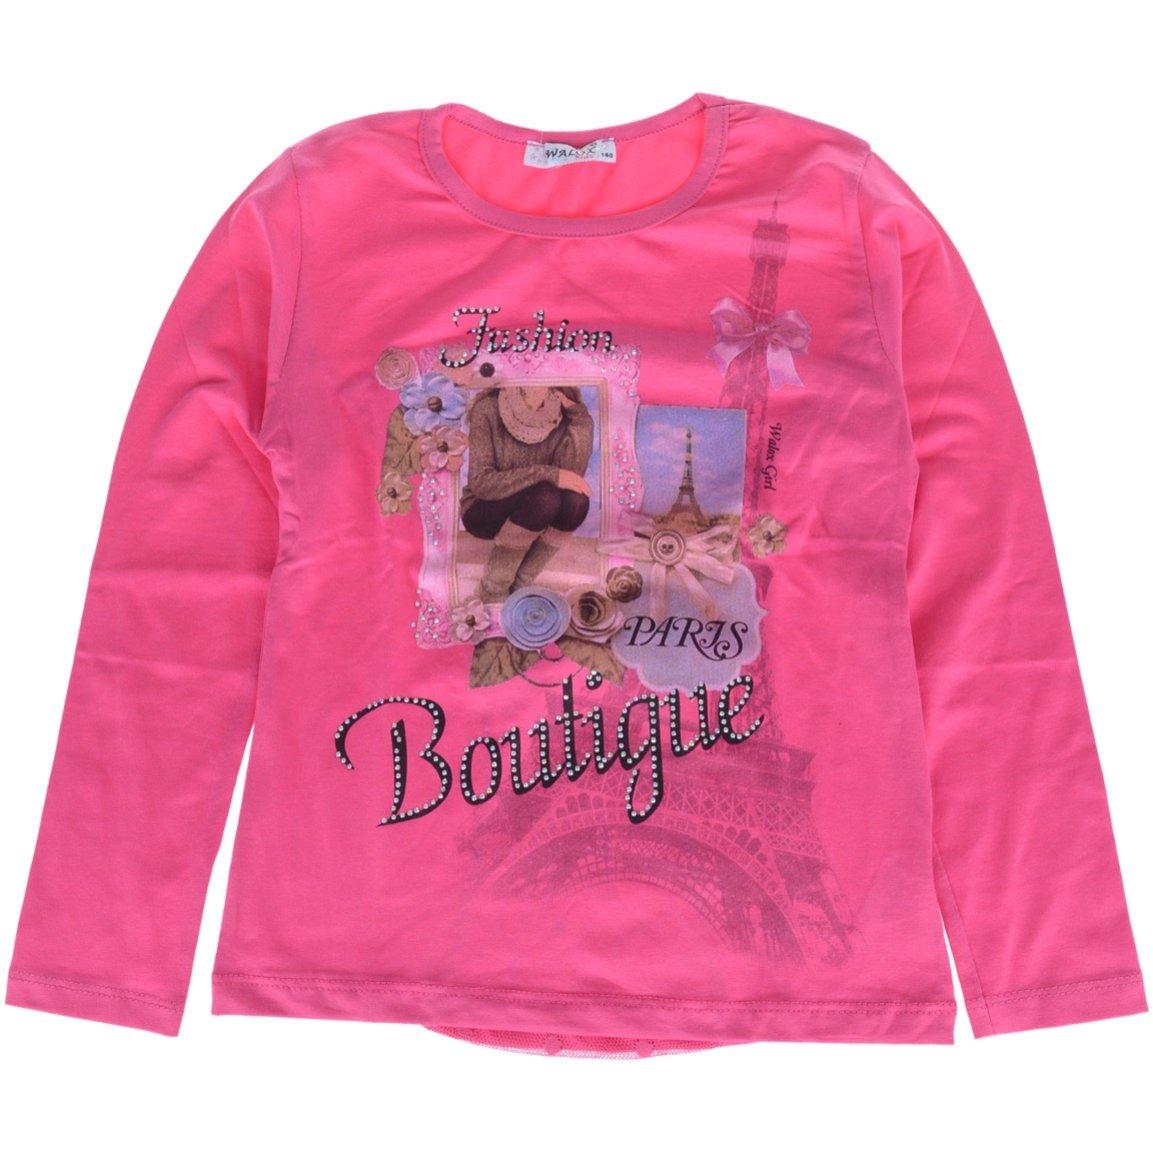 Walox παιδική εποχιακή μπλούζα «Fashion Boutique»